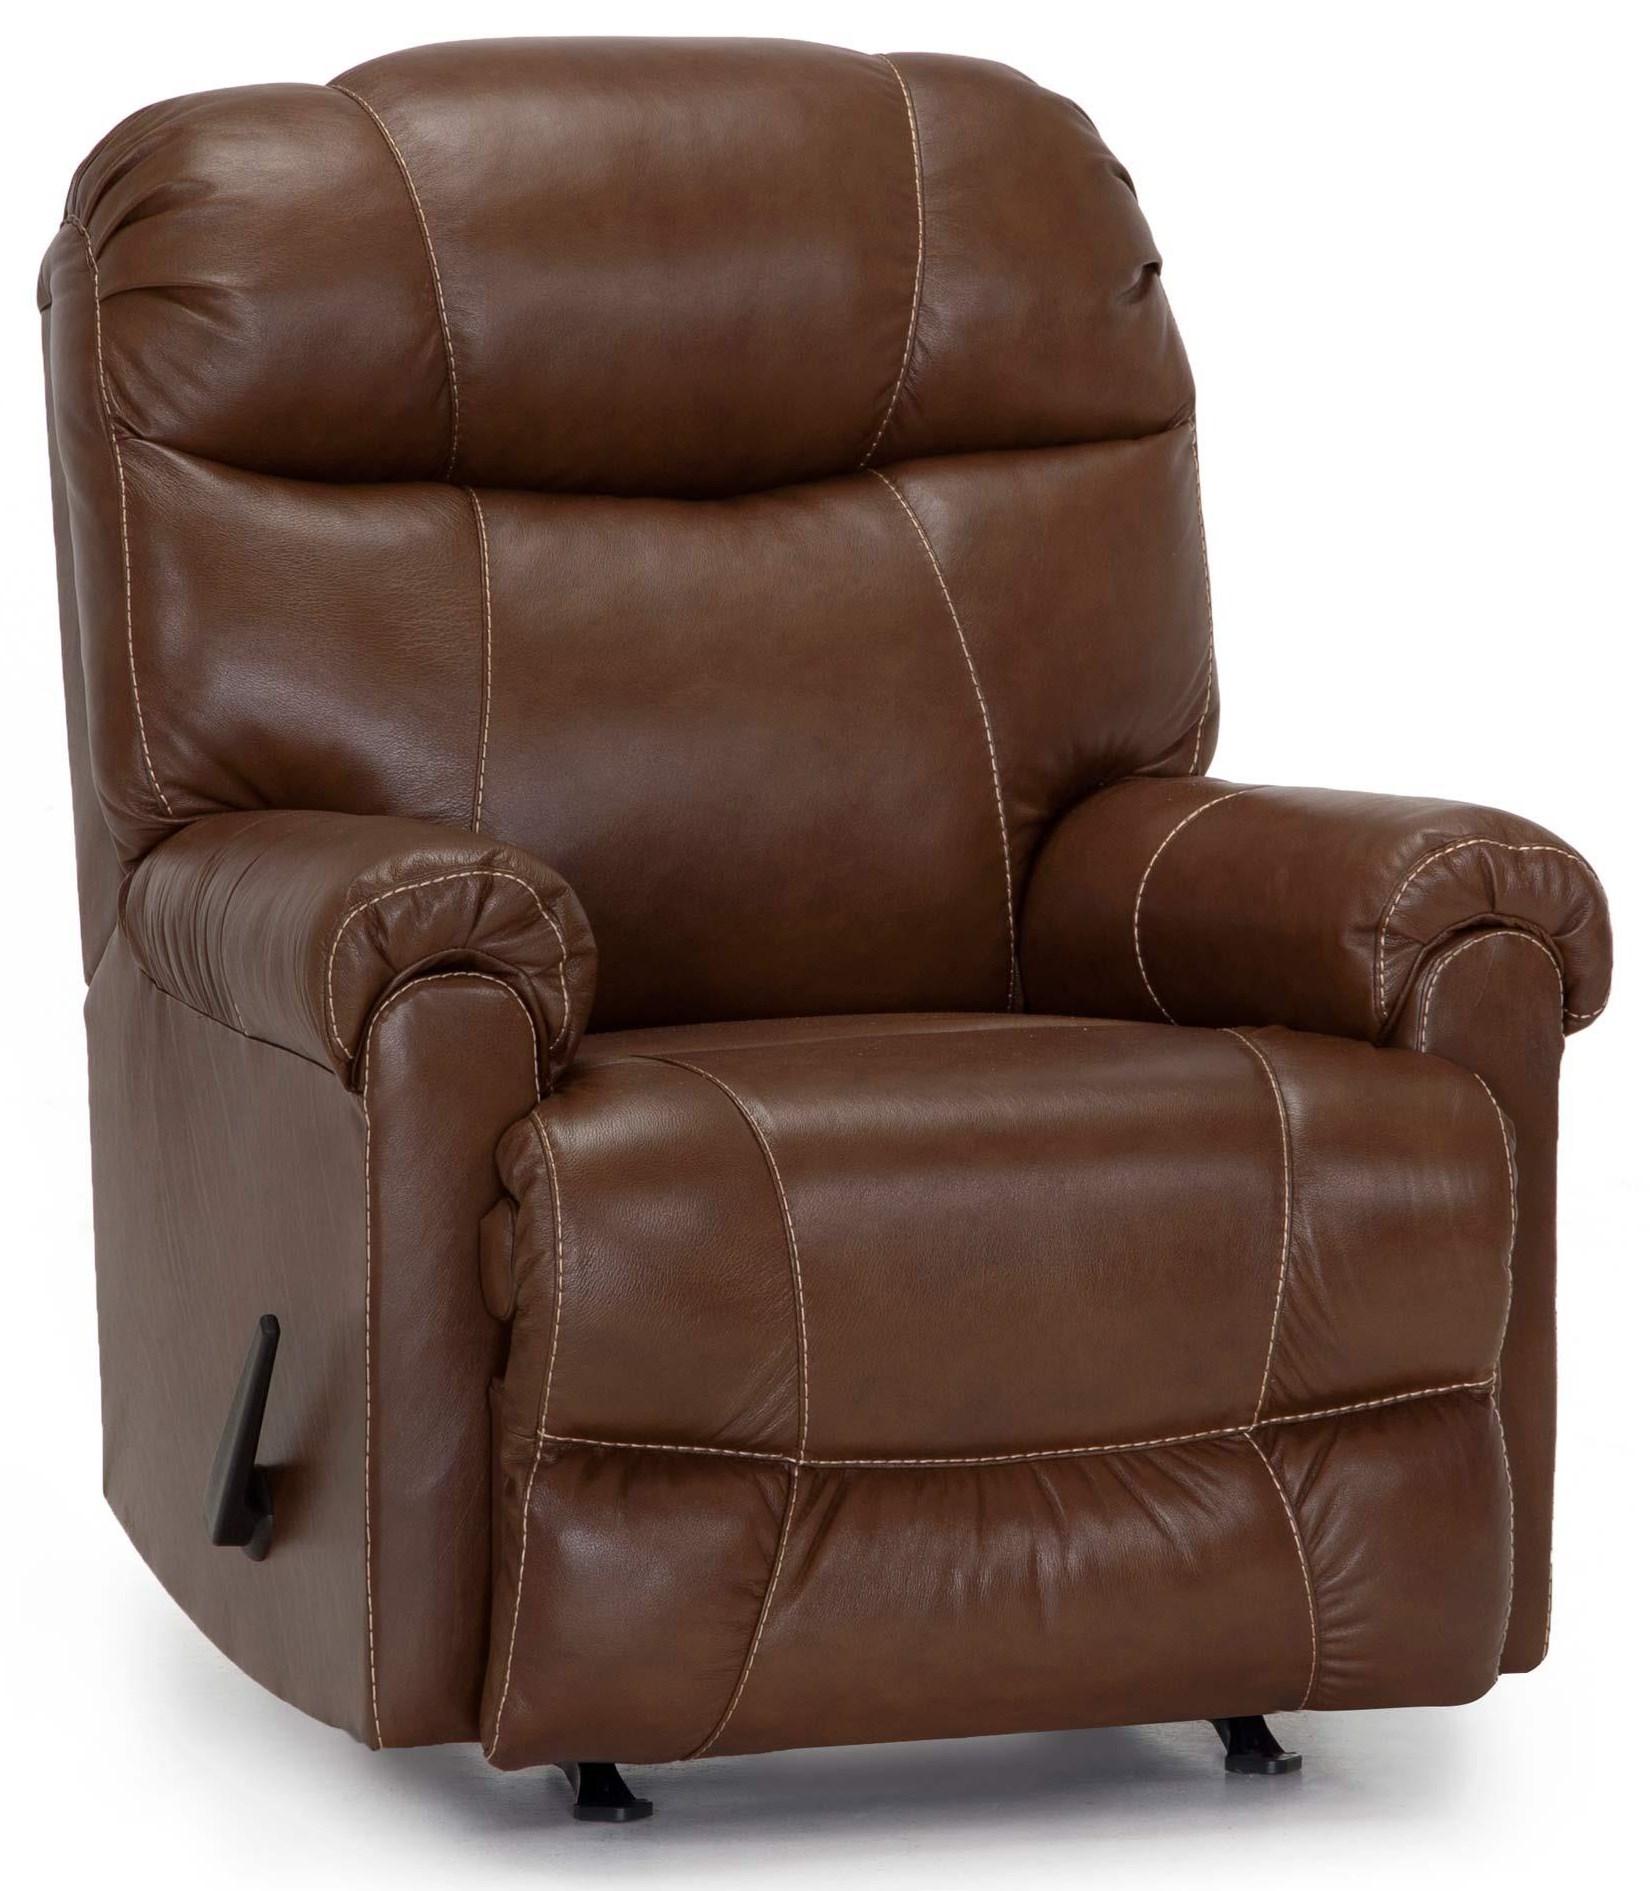 8566 Leather Rocker Recliner by Franklin at Furniture Fair - North Carolina